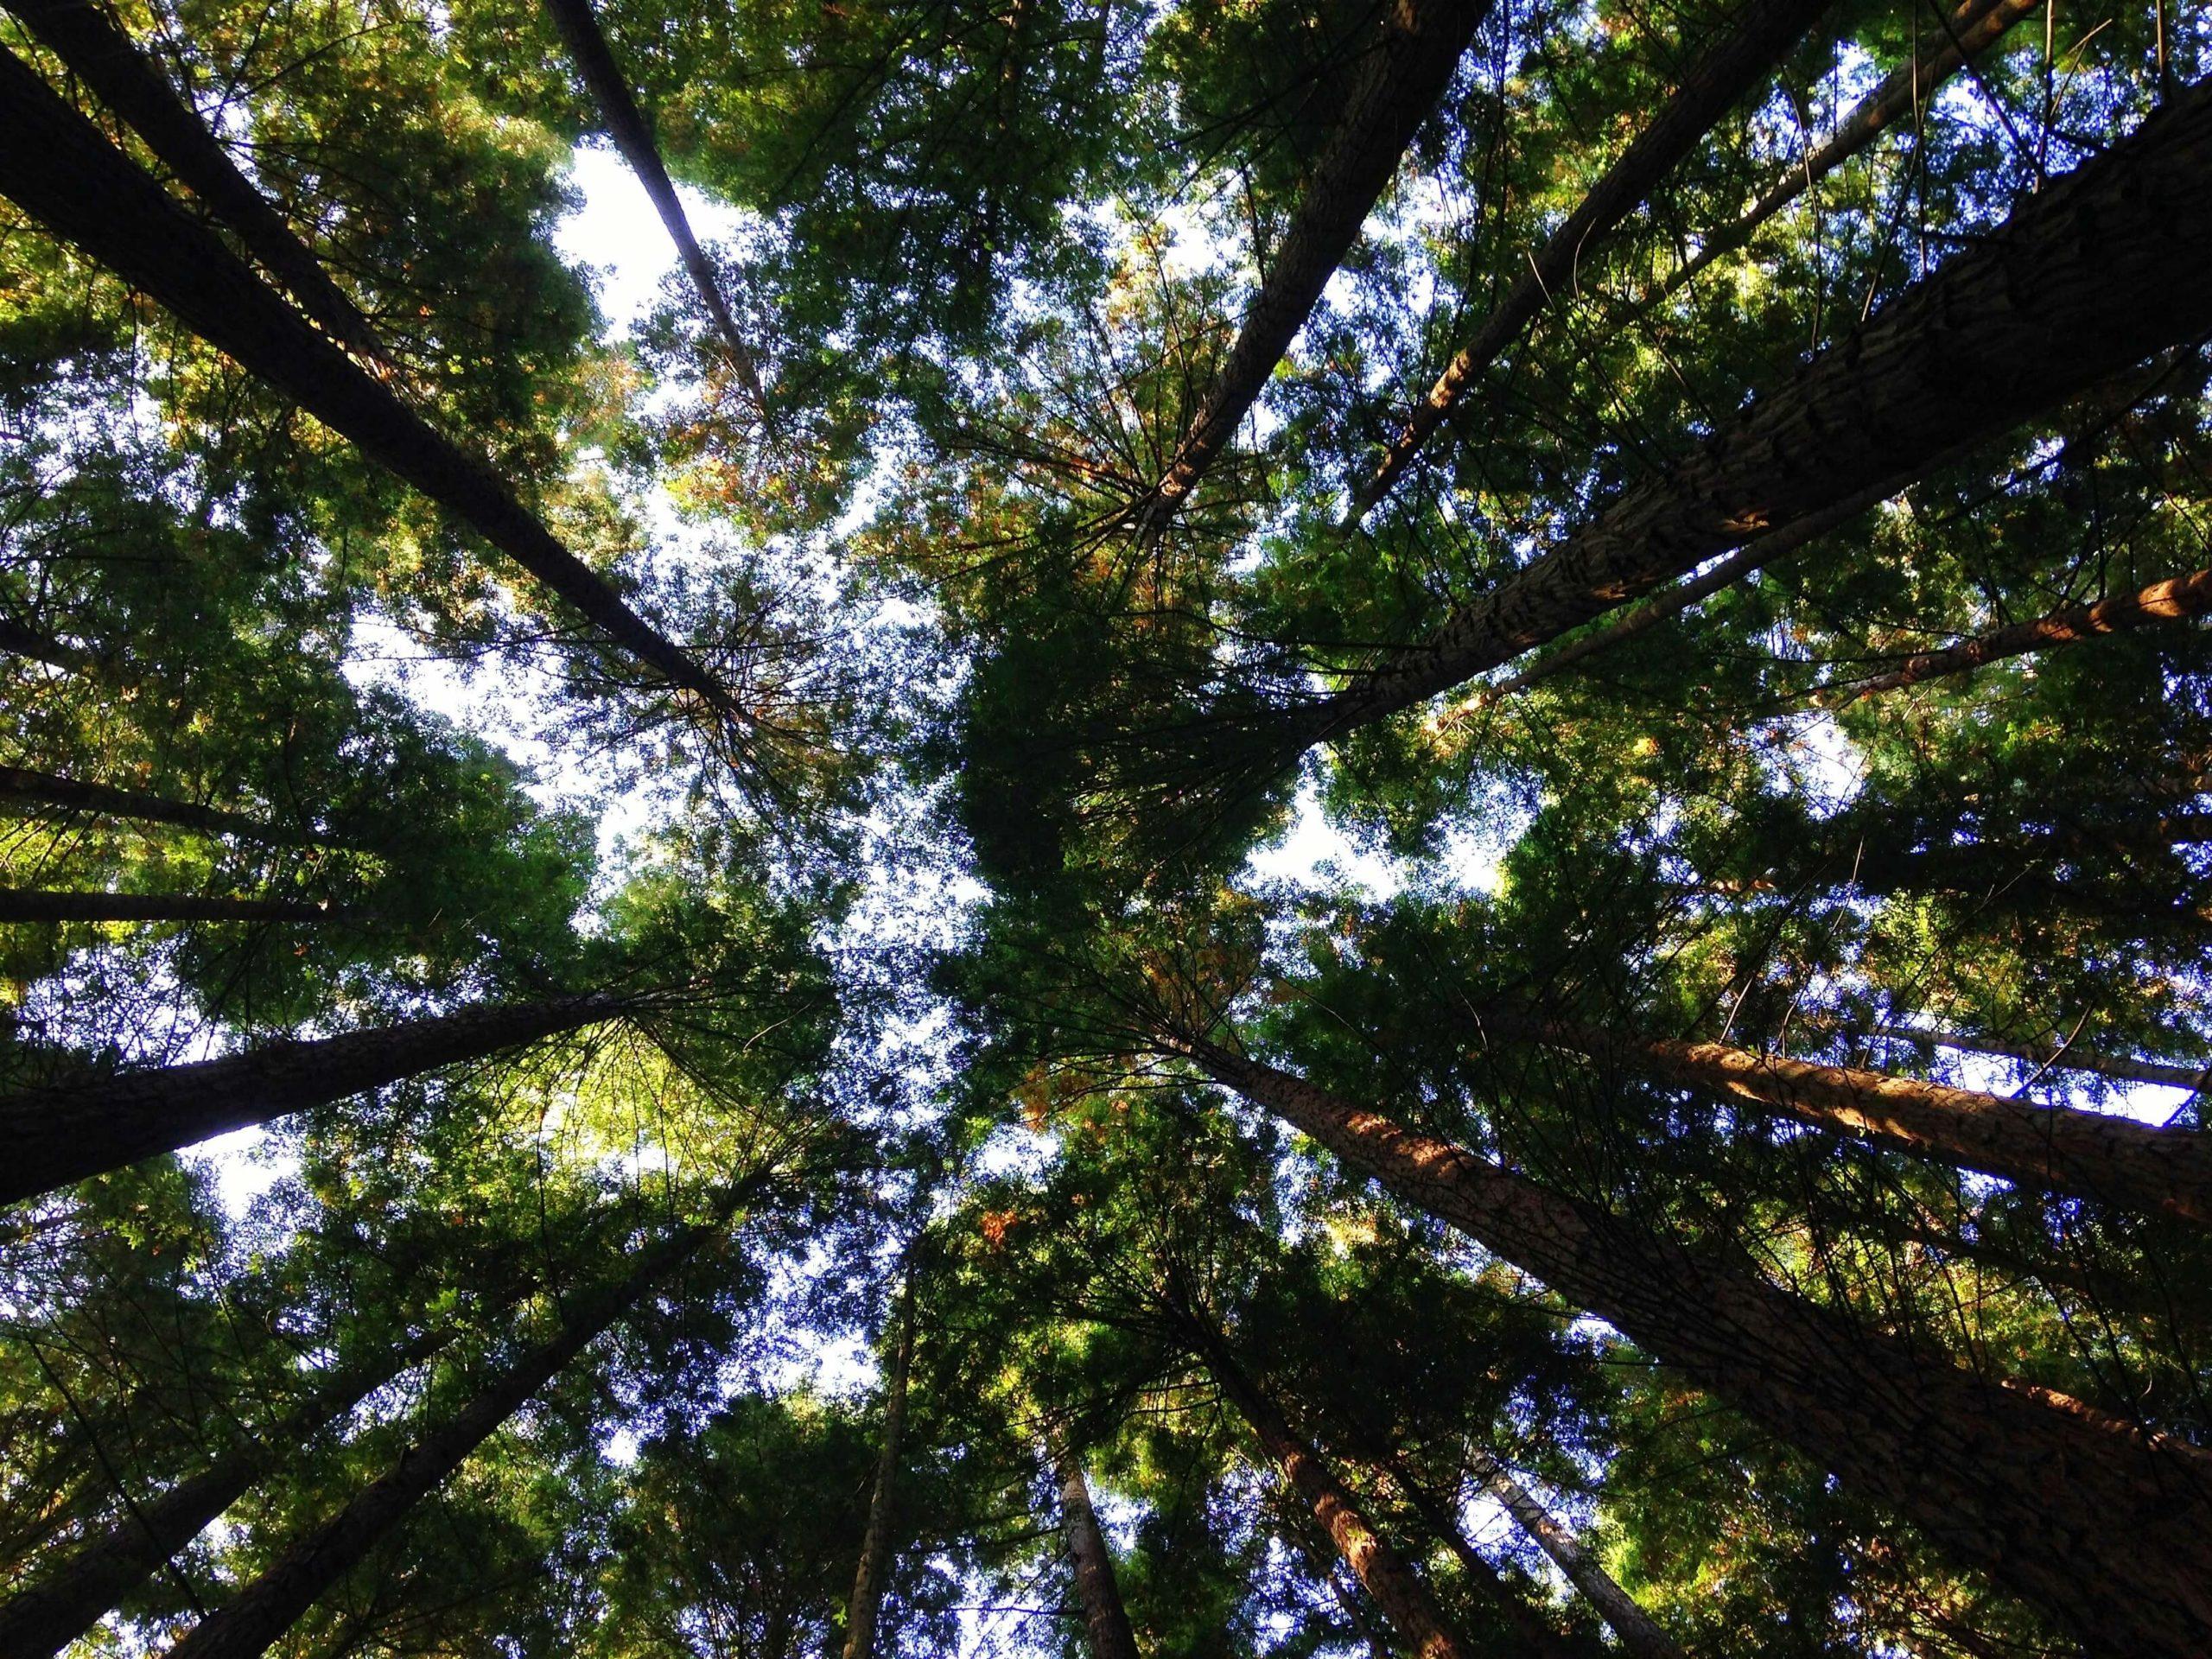 arbres grandissent ensemble